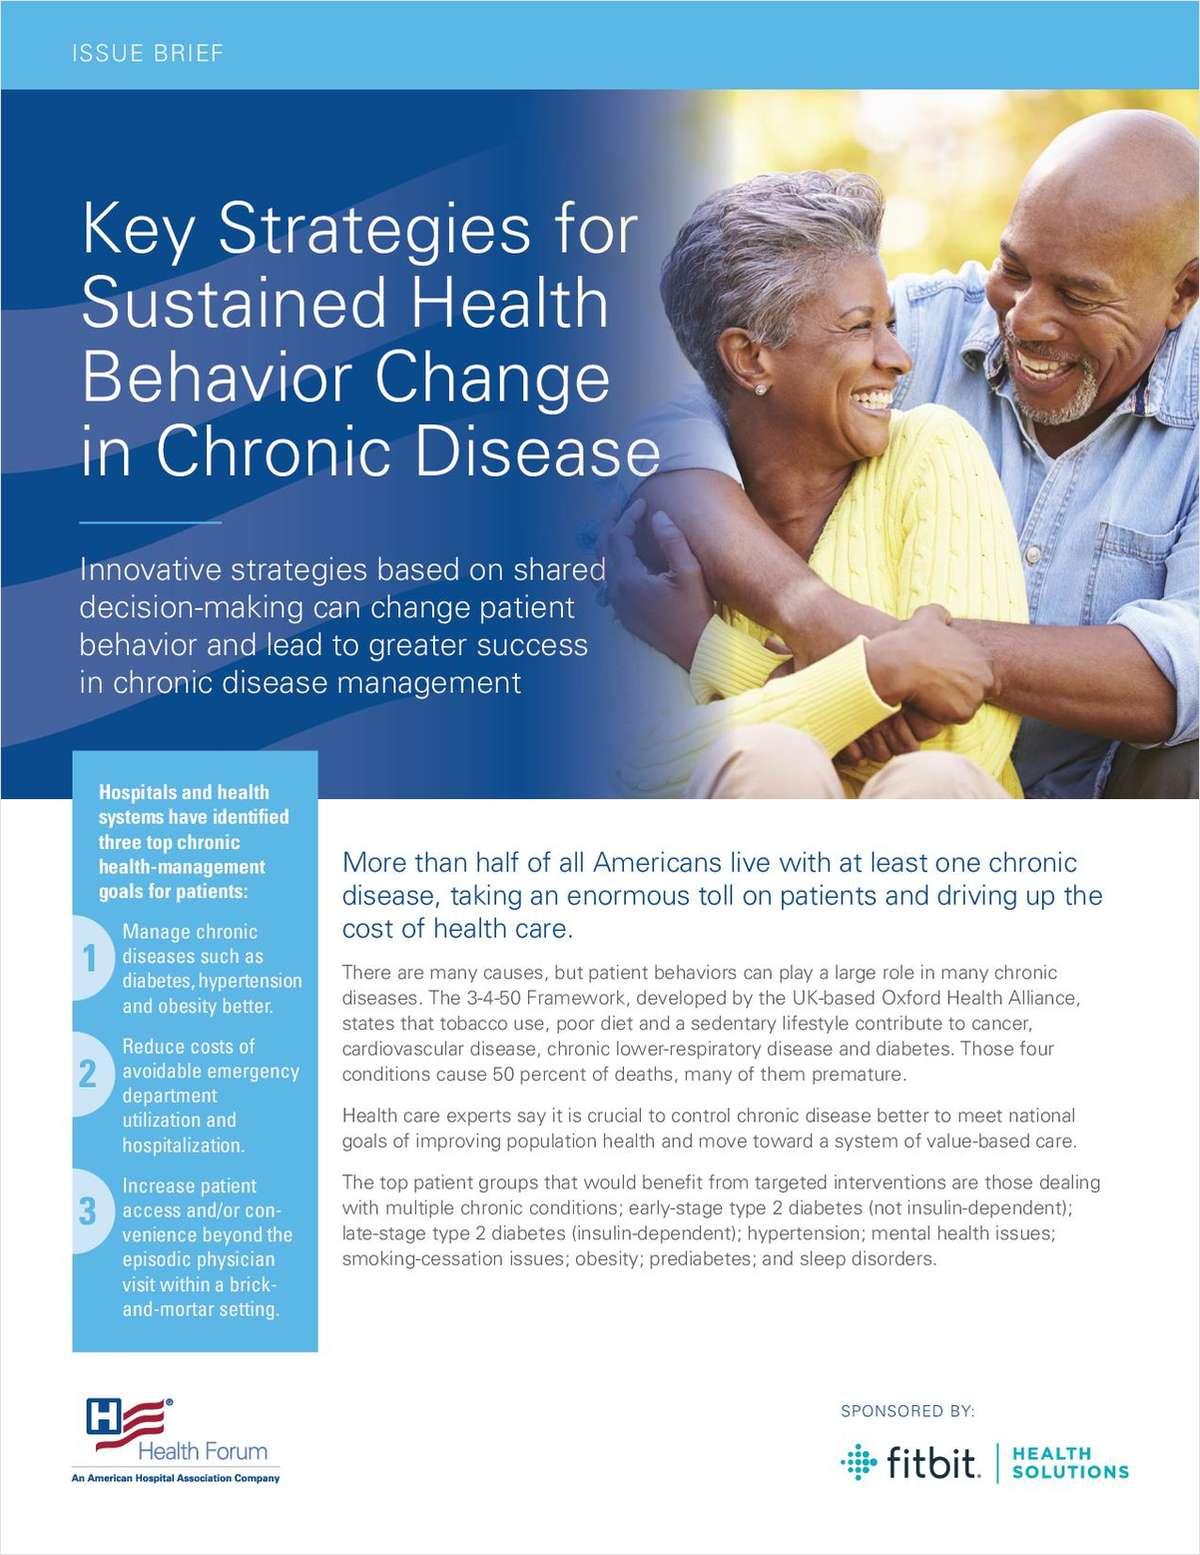 Key Strategies for Sustained Health Behavior Change in Chronic Disease